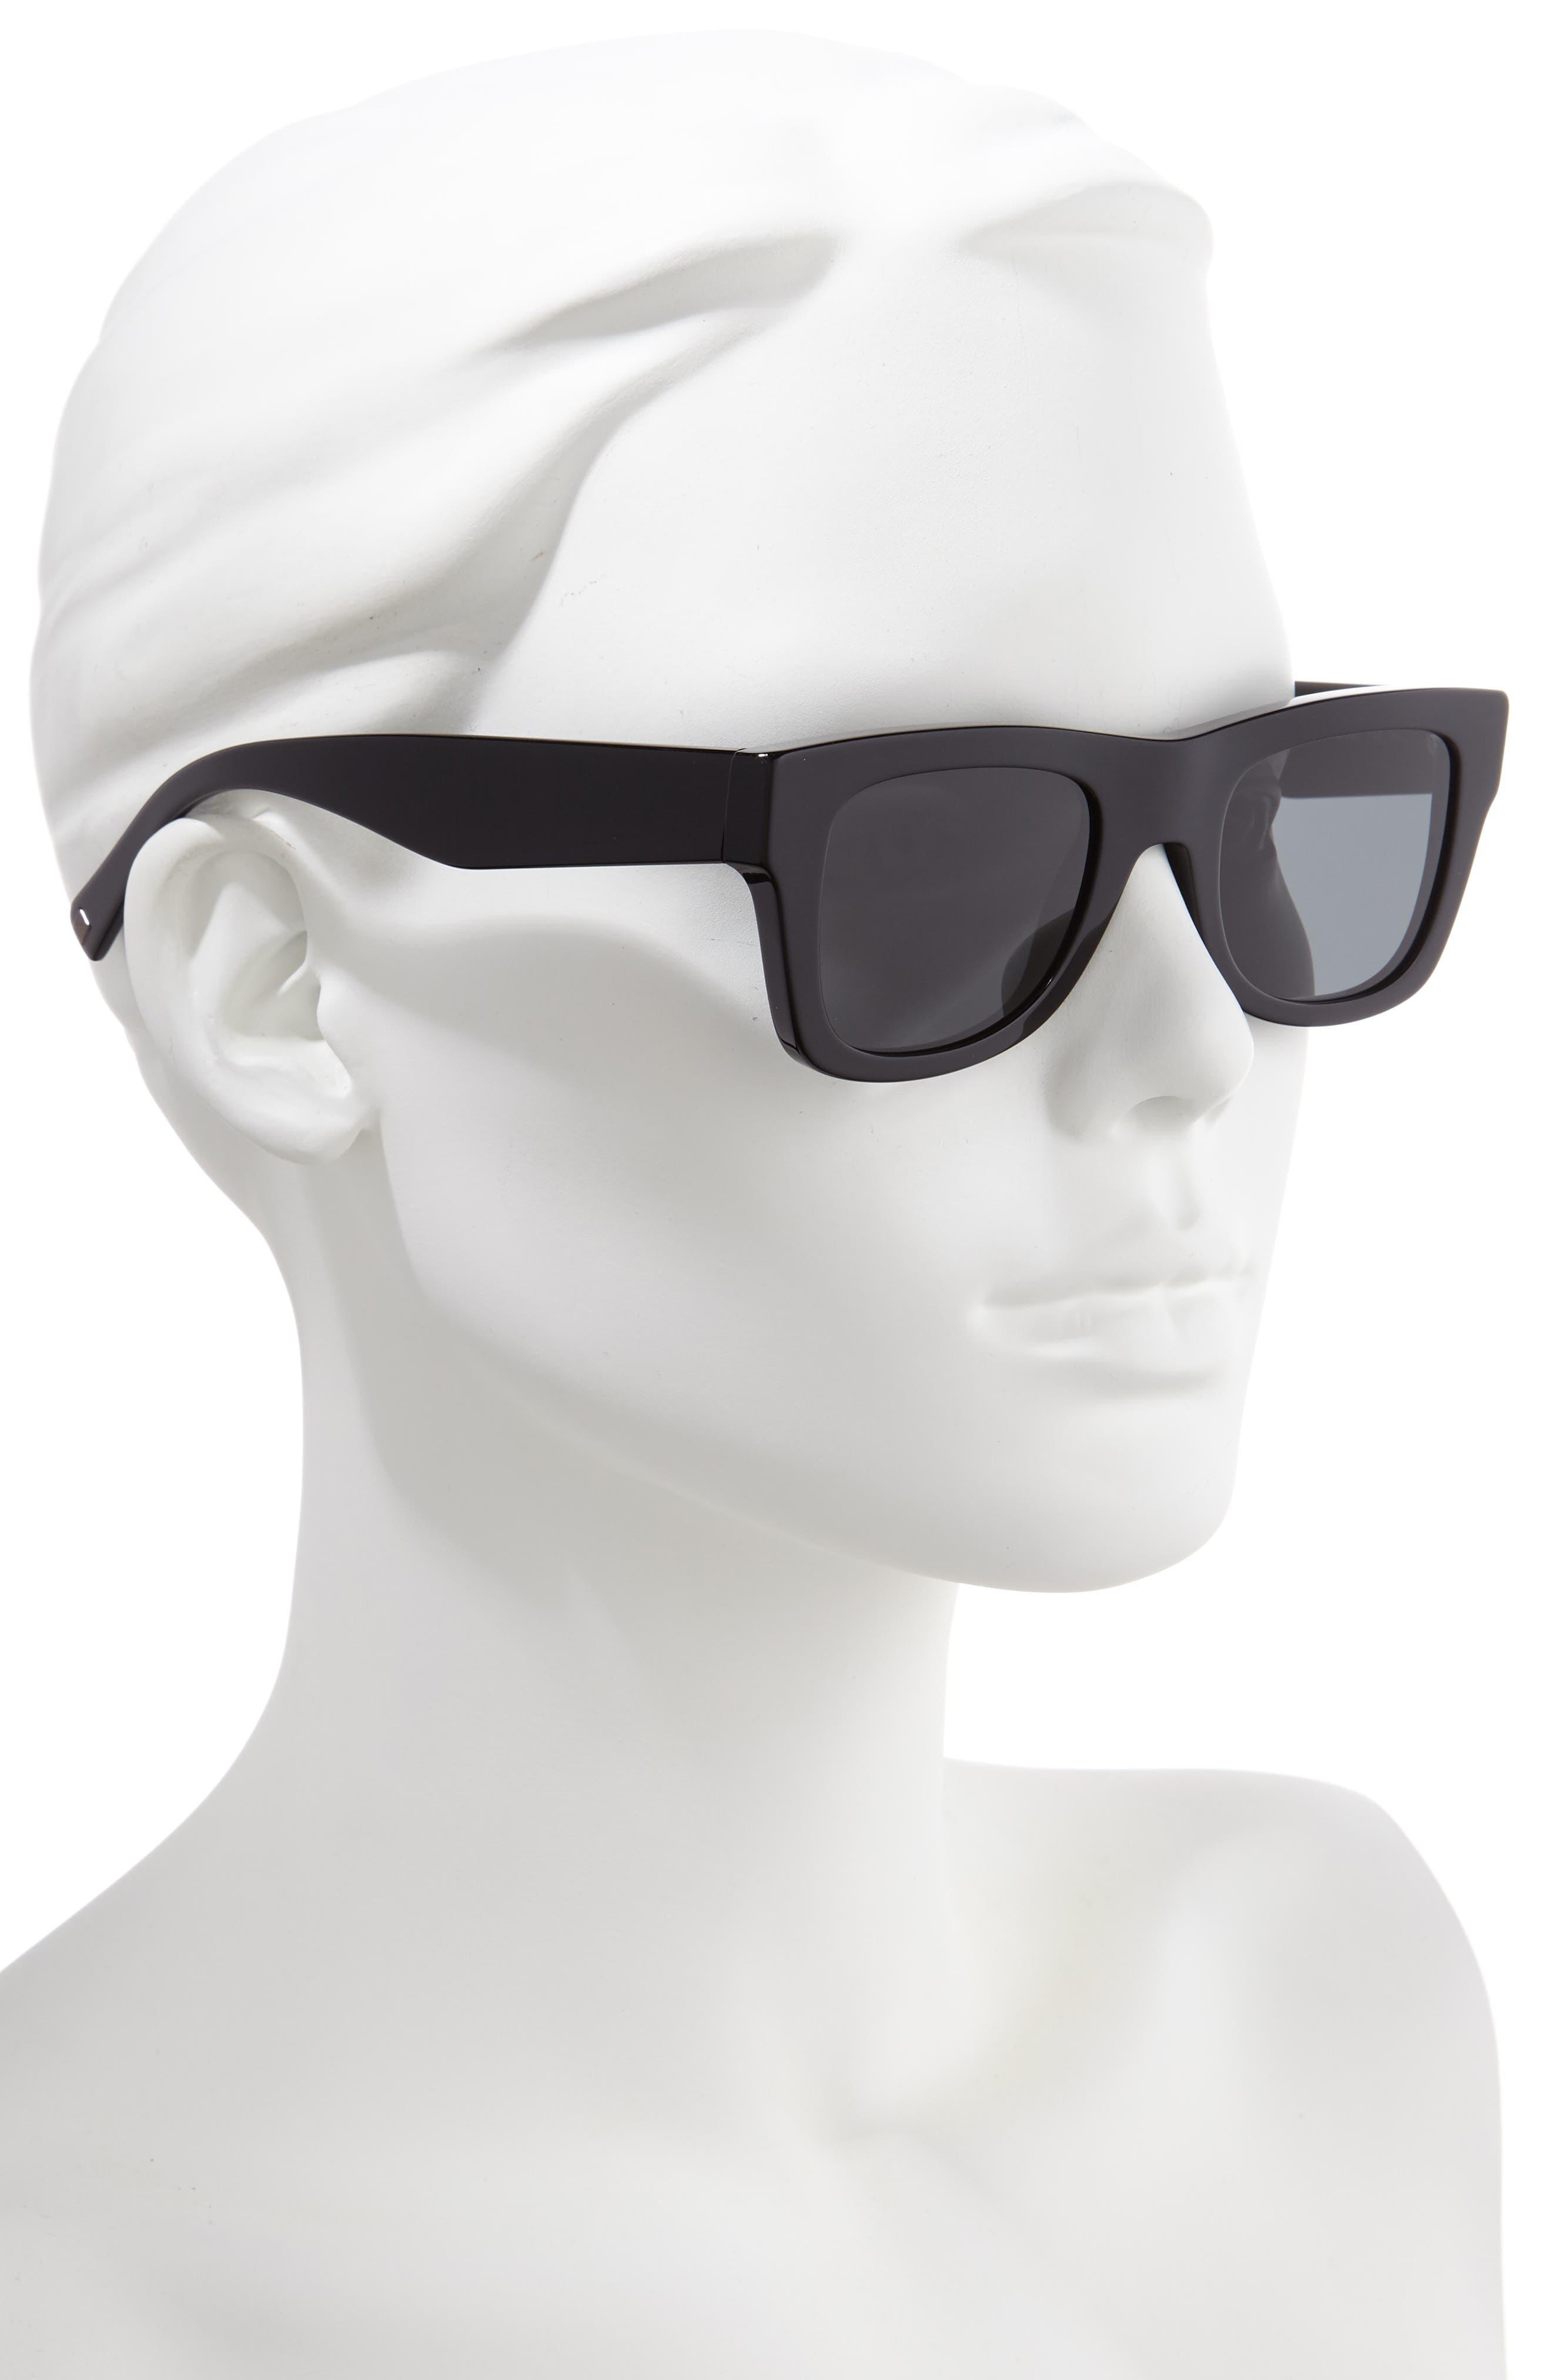 VALENTINO, VLTN 50mm Square Sunglasses, Alternate thumbnail 2, color, BLACK SOLID